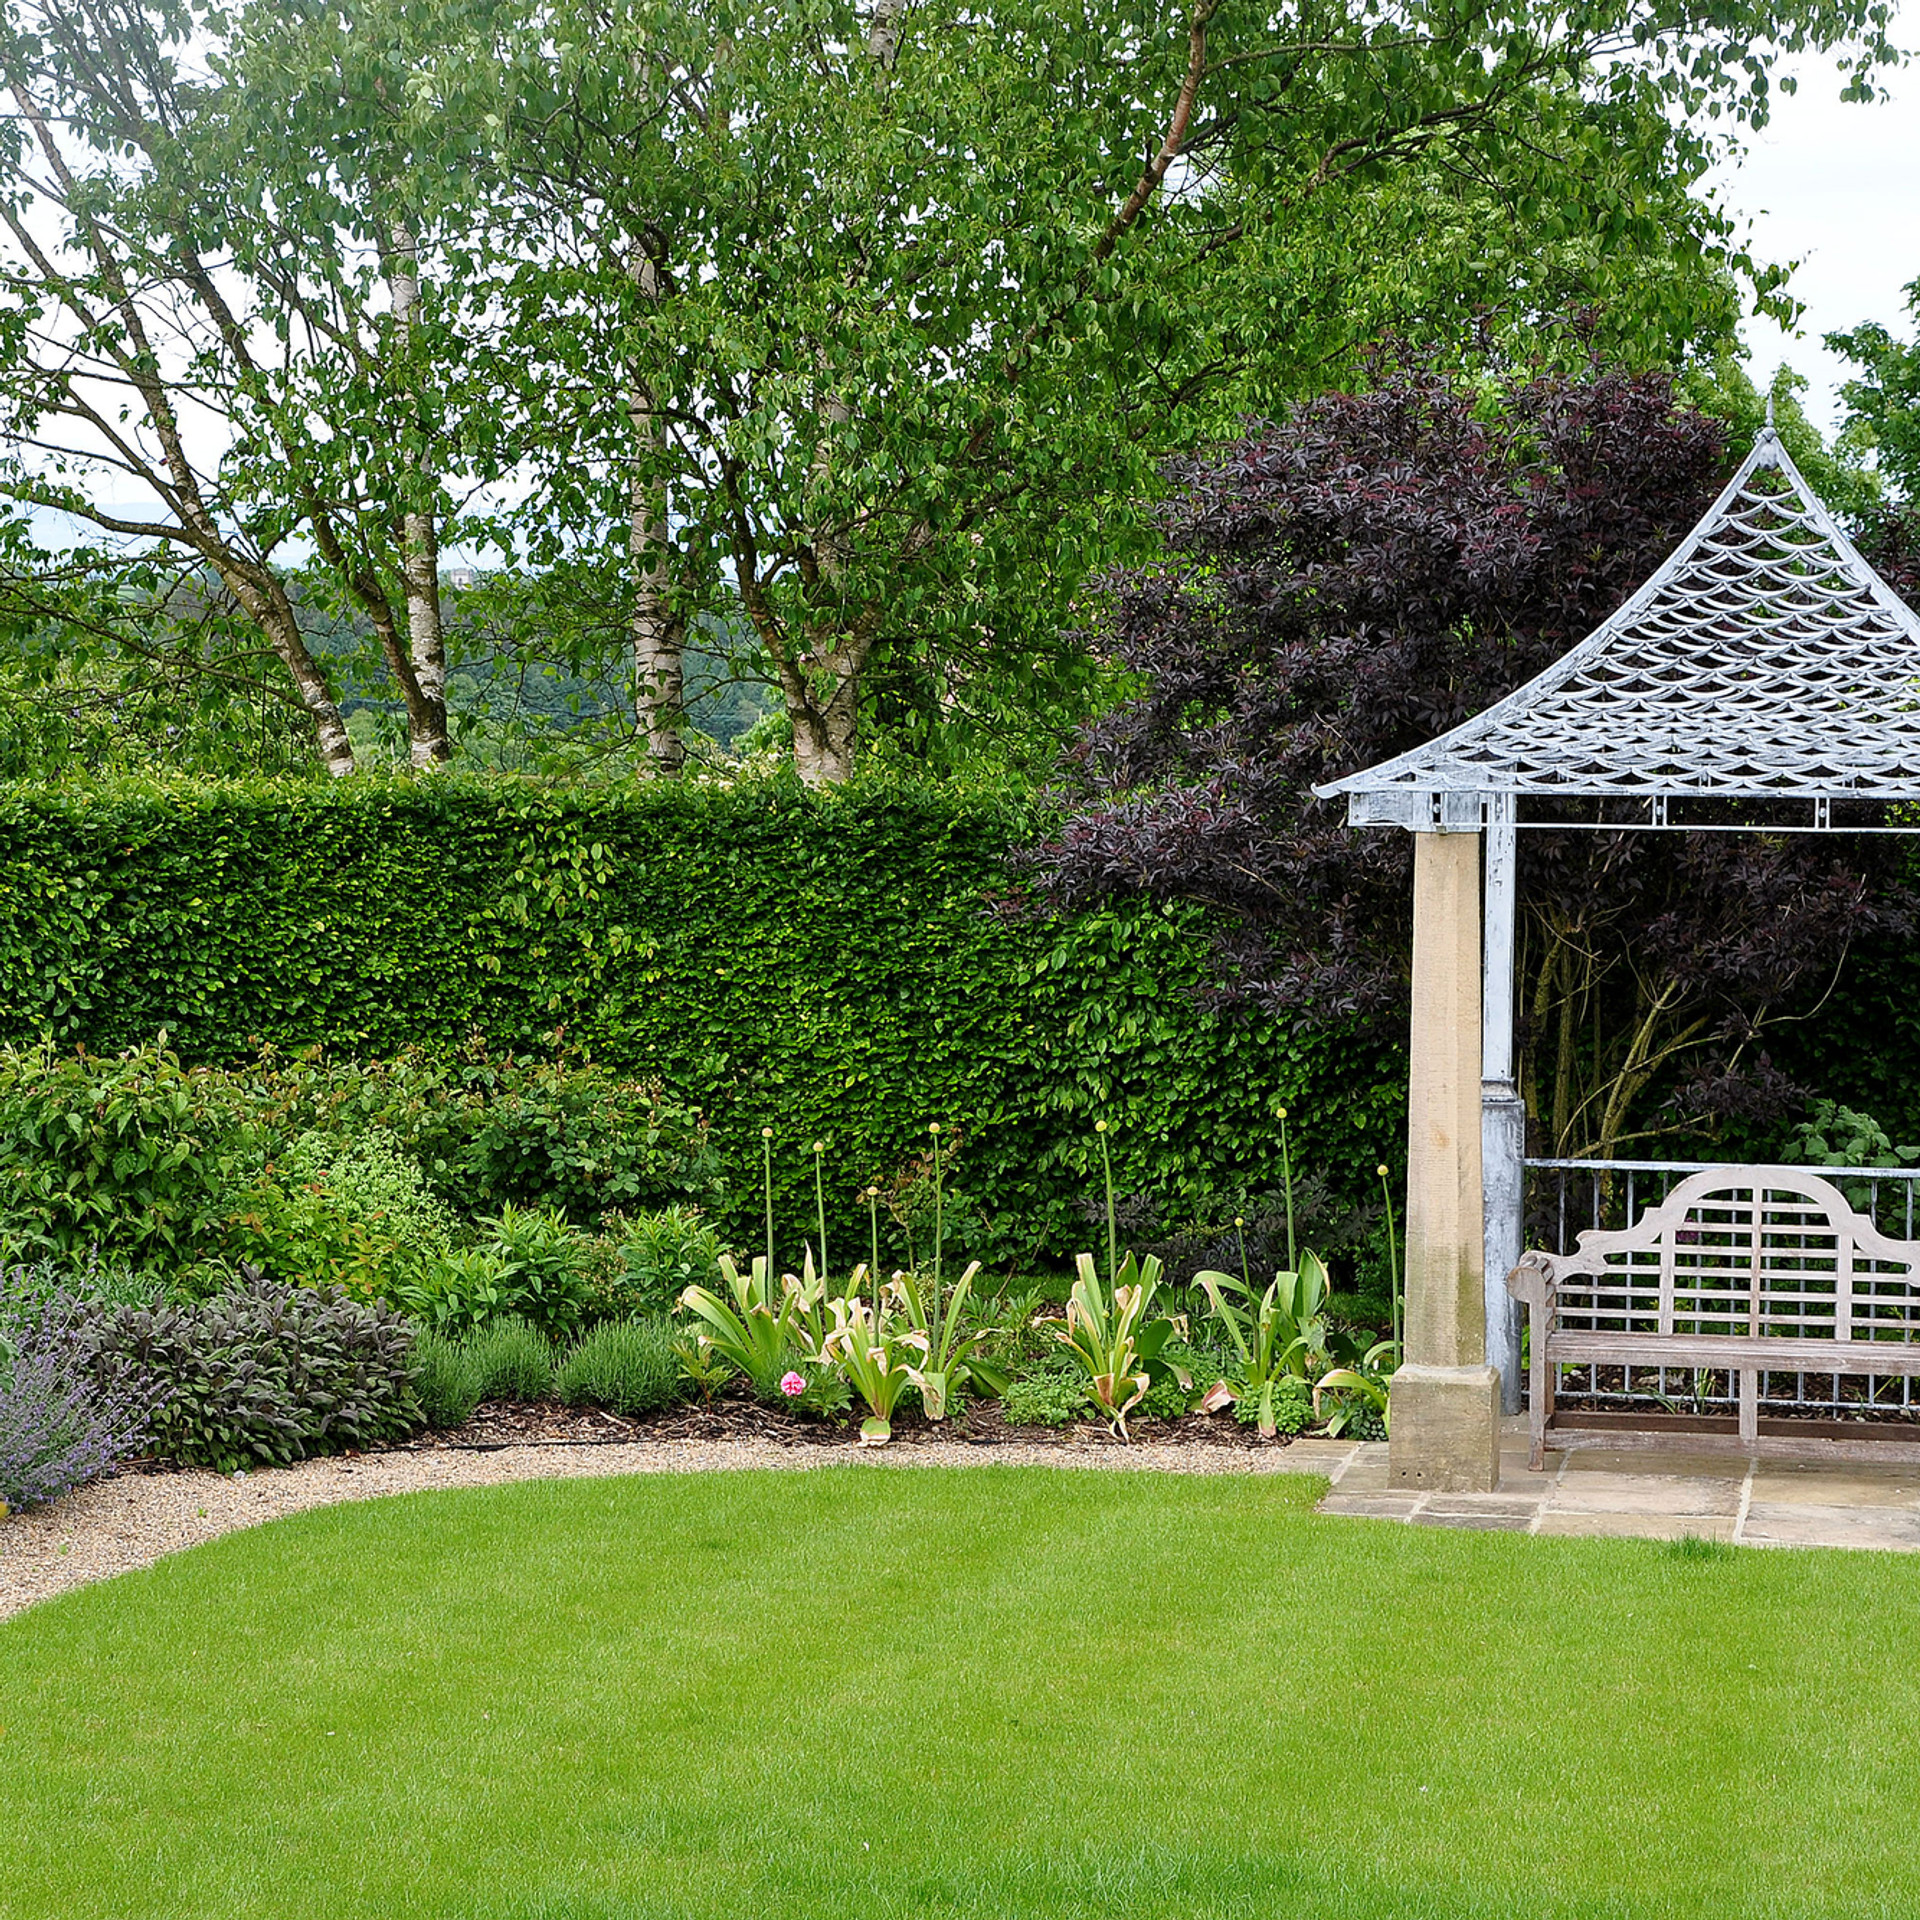 Grantley Grange